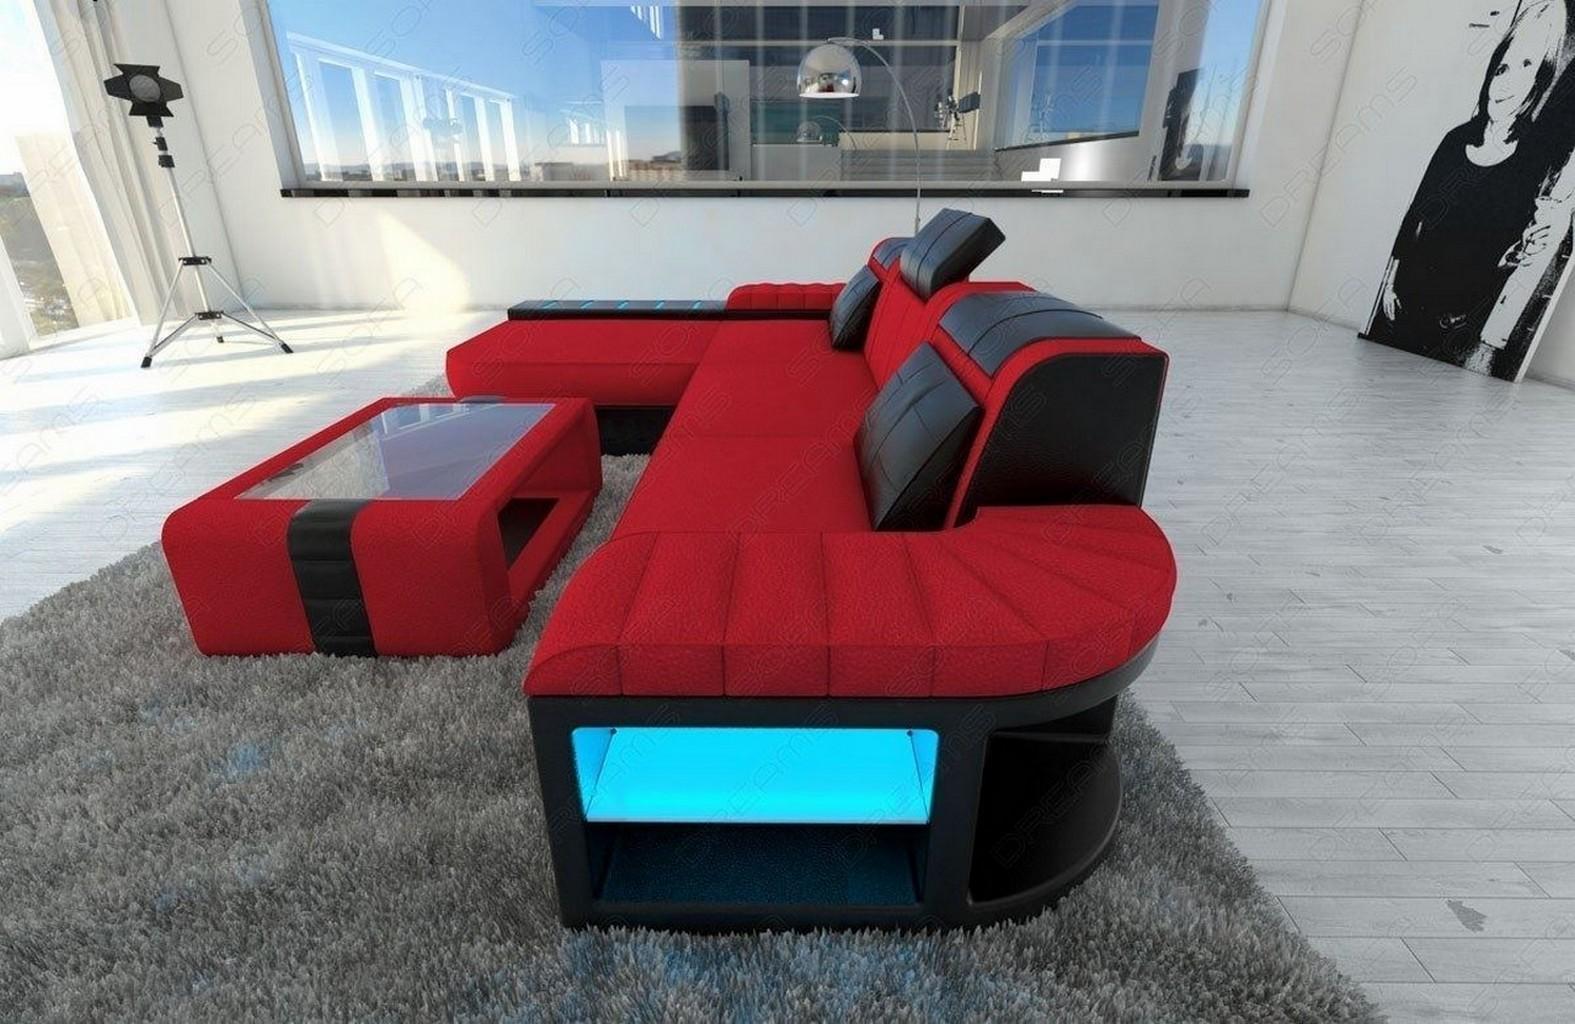 stoffsofa eckcouch bellagio l form led beleuchtung stoff. Black Bedroom Furniture Sets. Home Design Ideas